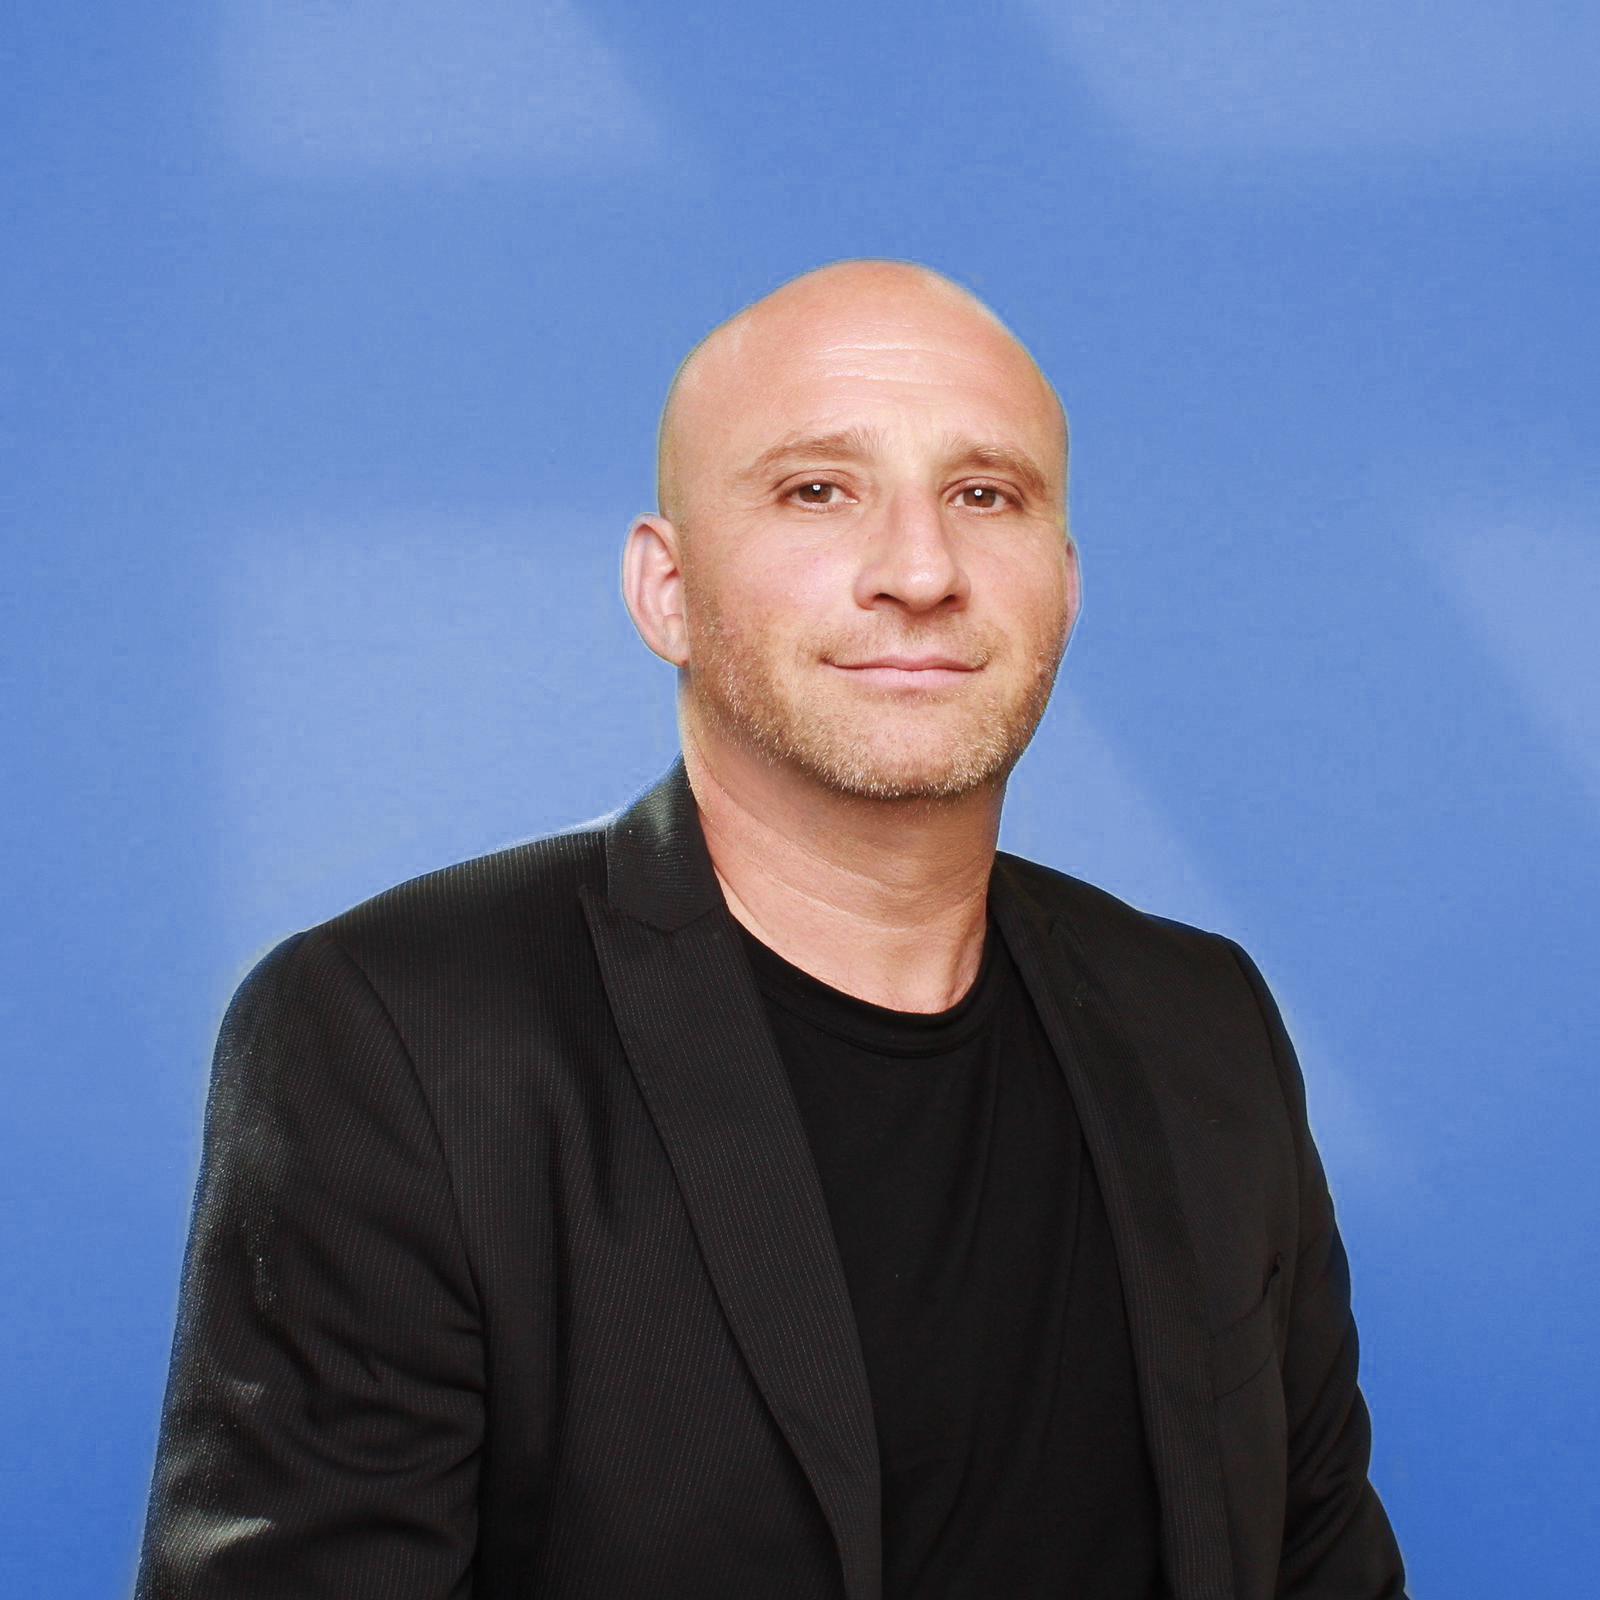 Home365 CEO Daniel Shaked. Photo: Courtesy: